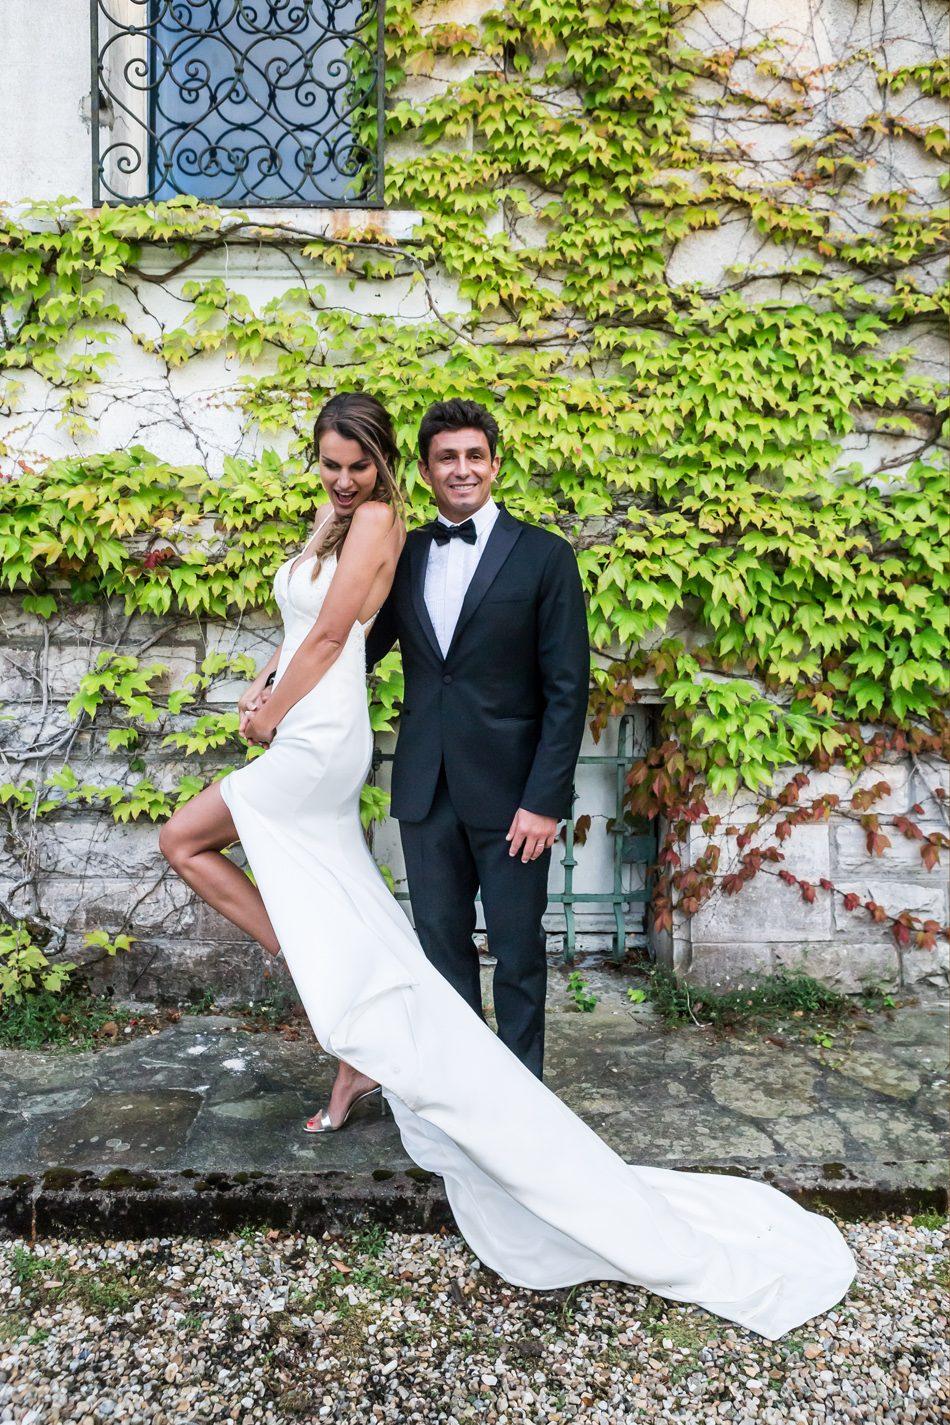 ruban collectif photographe landes france pays basque papeterie mariage fleuriste aquitaine wedding photography an lalemant